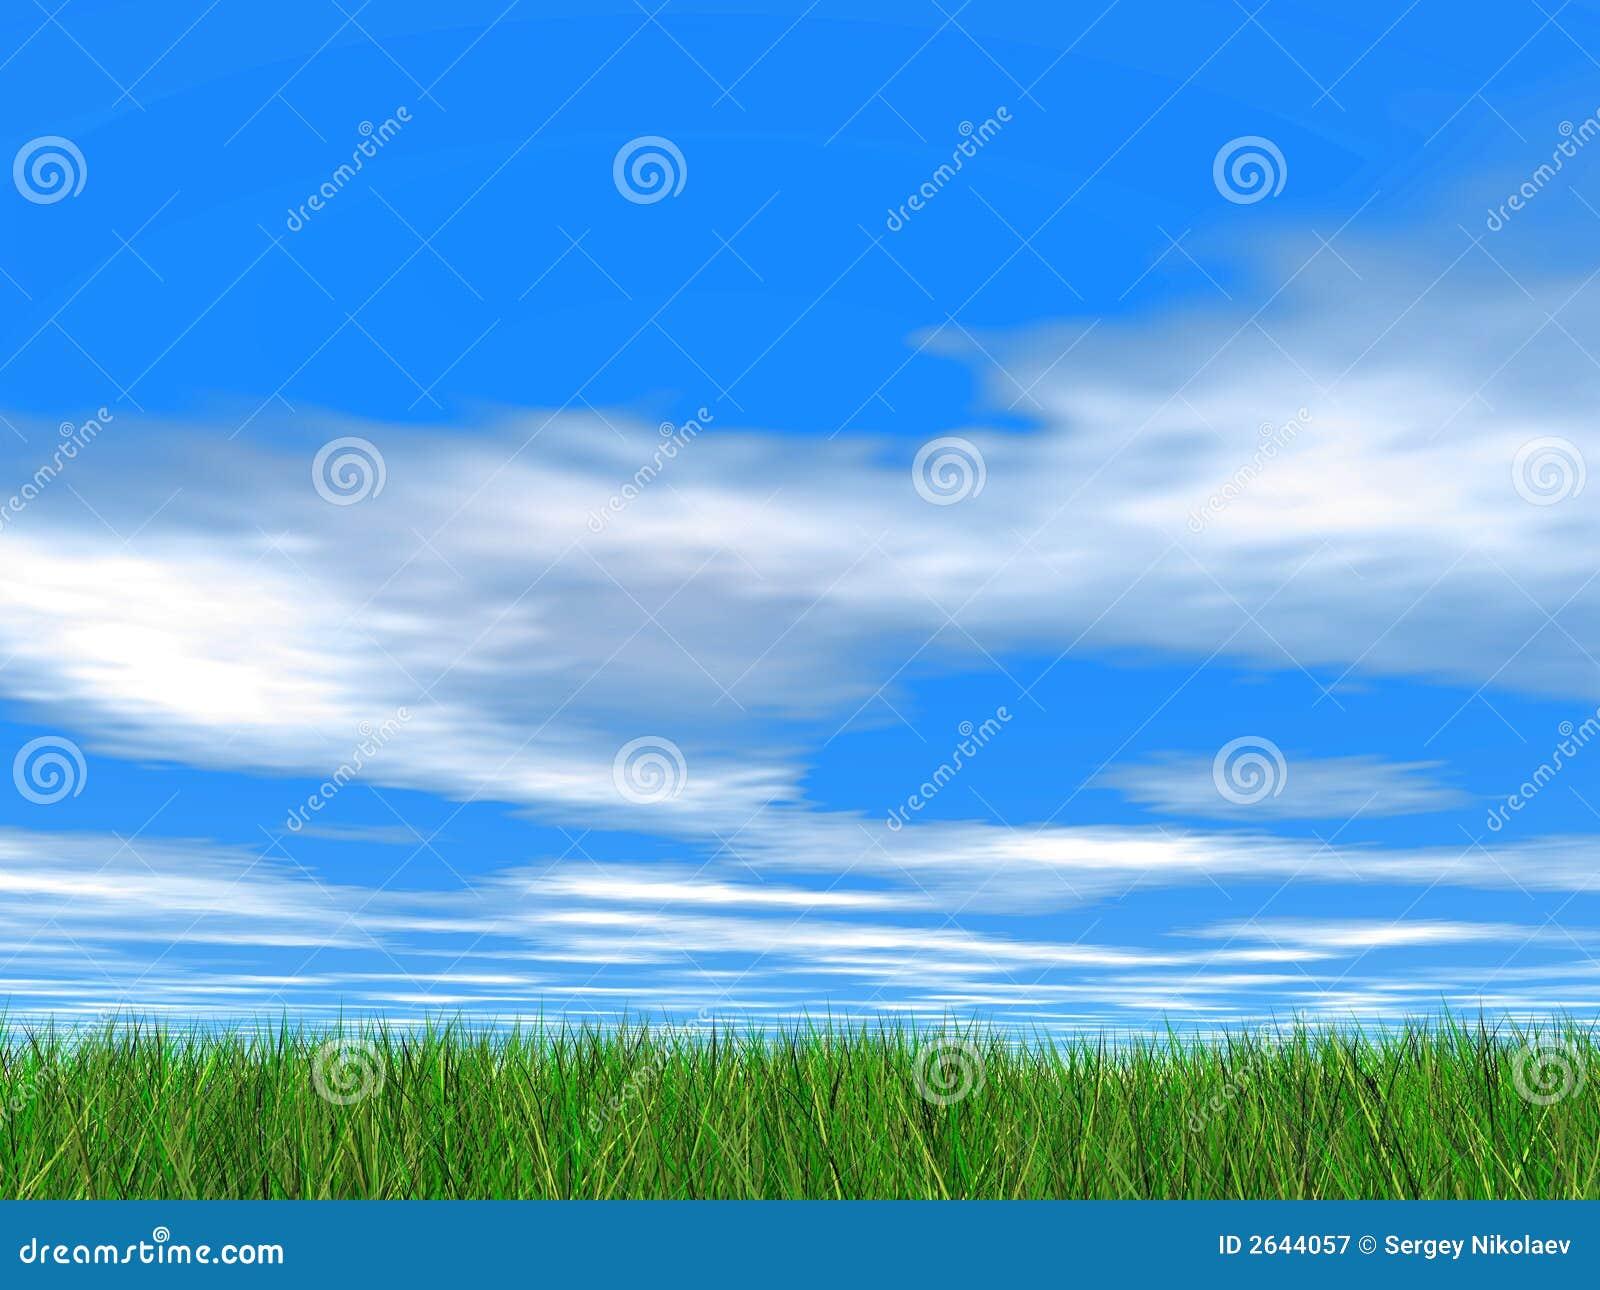 Idyllic sky